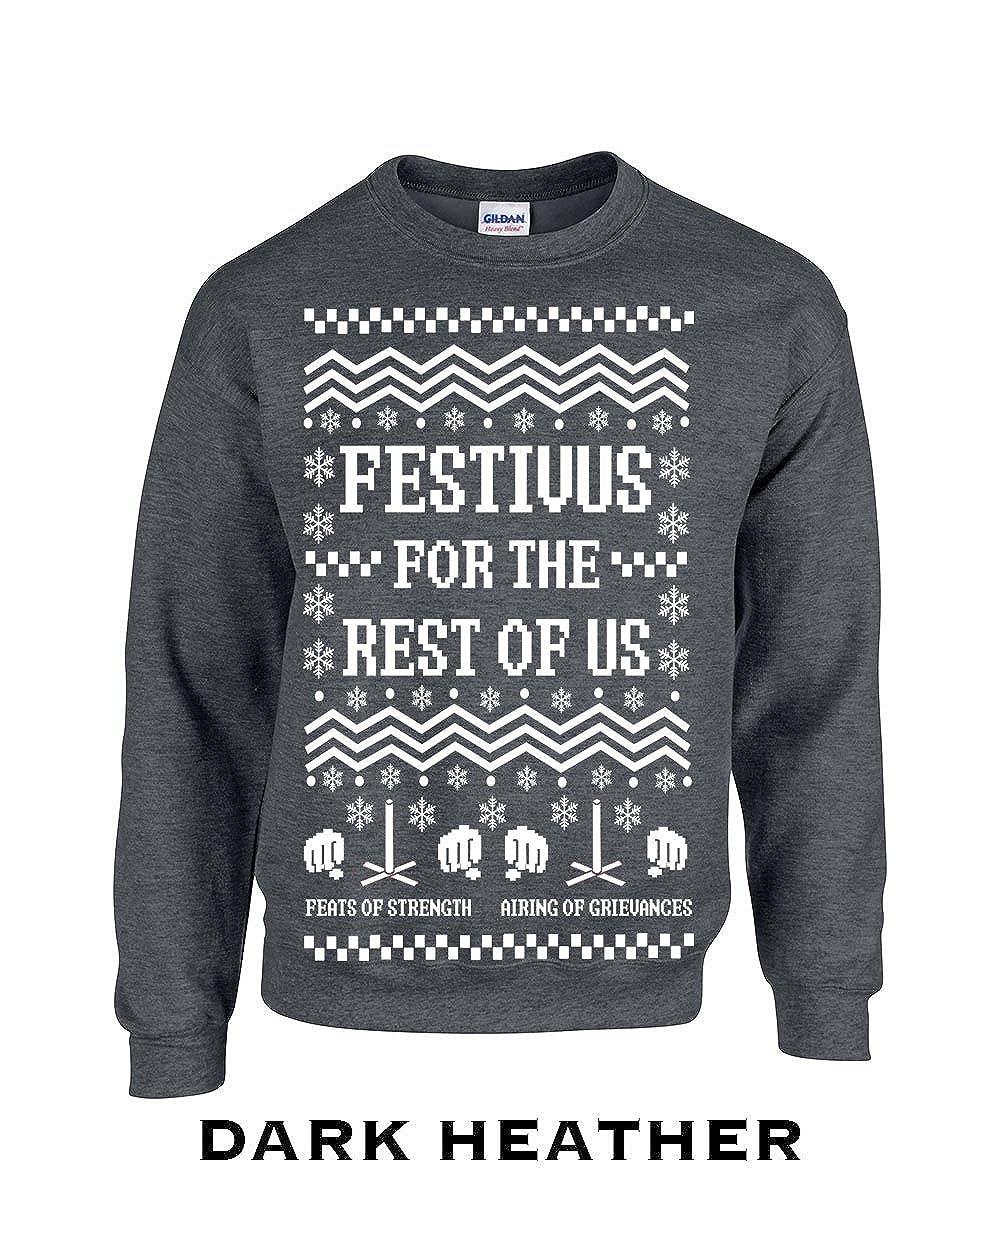 Swaffy Tees Festivus for The Rest of Us Adult Crew Sweatshirt